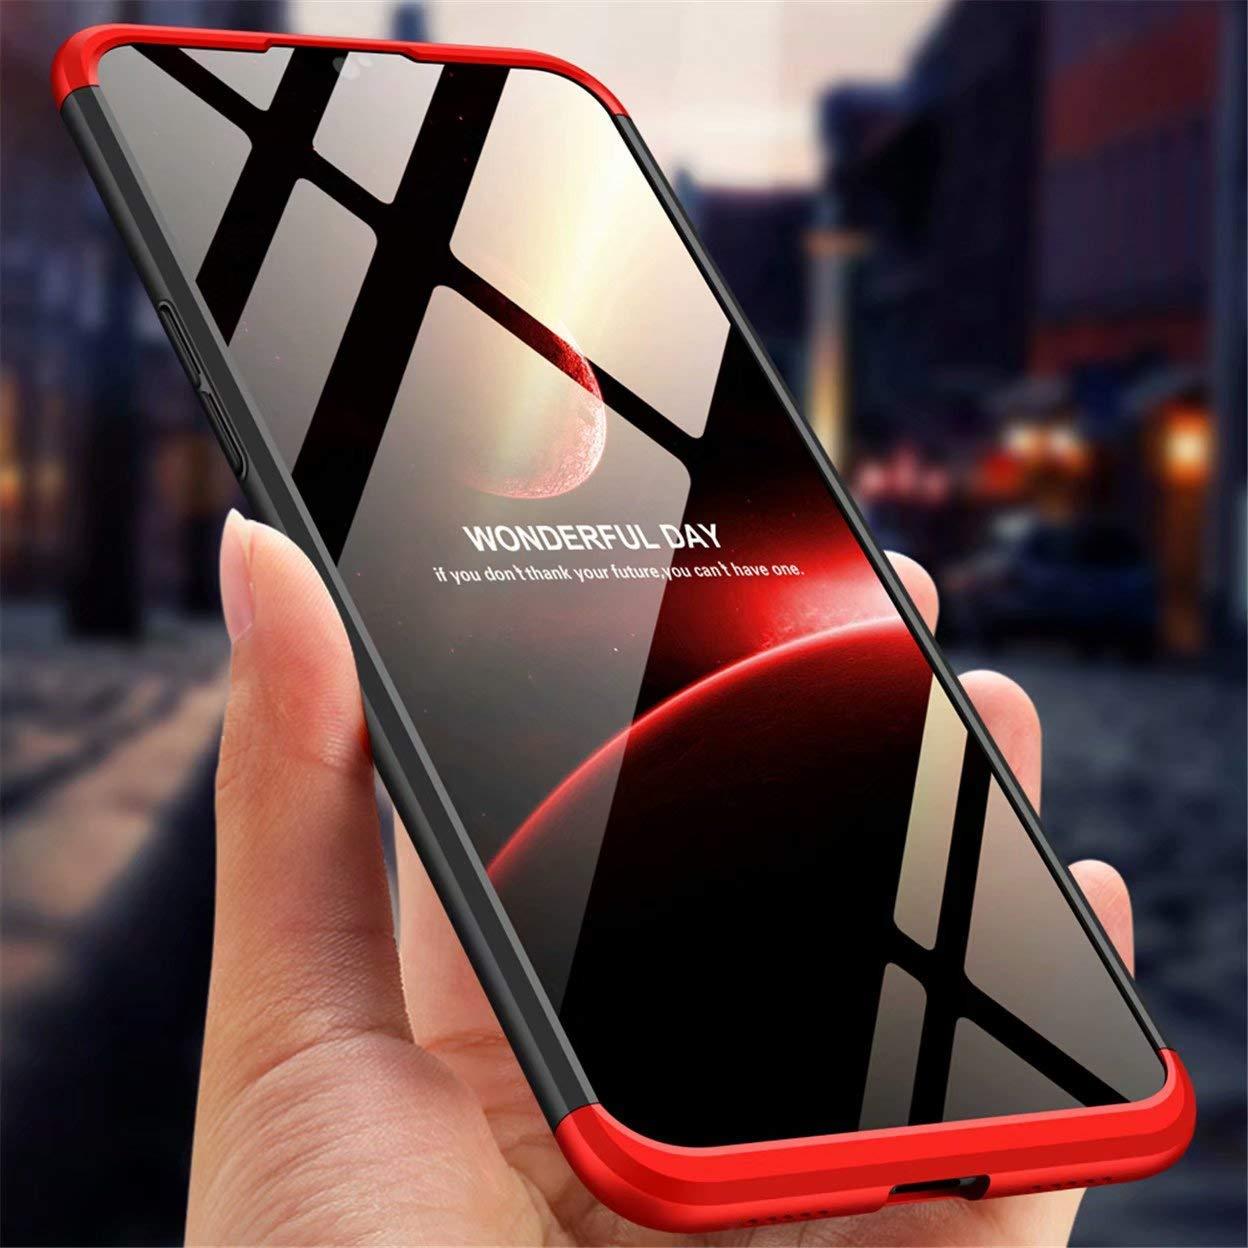 3 en 1 Ultra Thin Hard PC Case Premium Slim 360 Grados Full Body Protective Shockproof Cover for OnePlus 6. MRSTER OnePlus 6 Funda